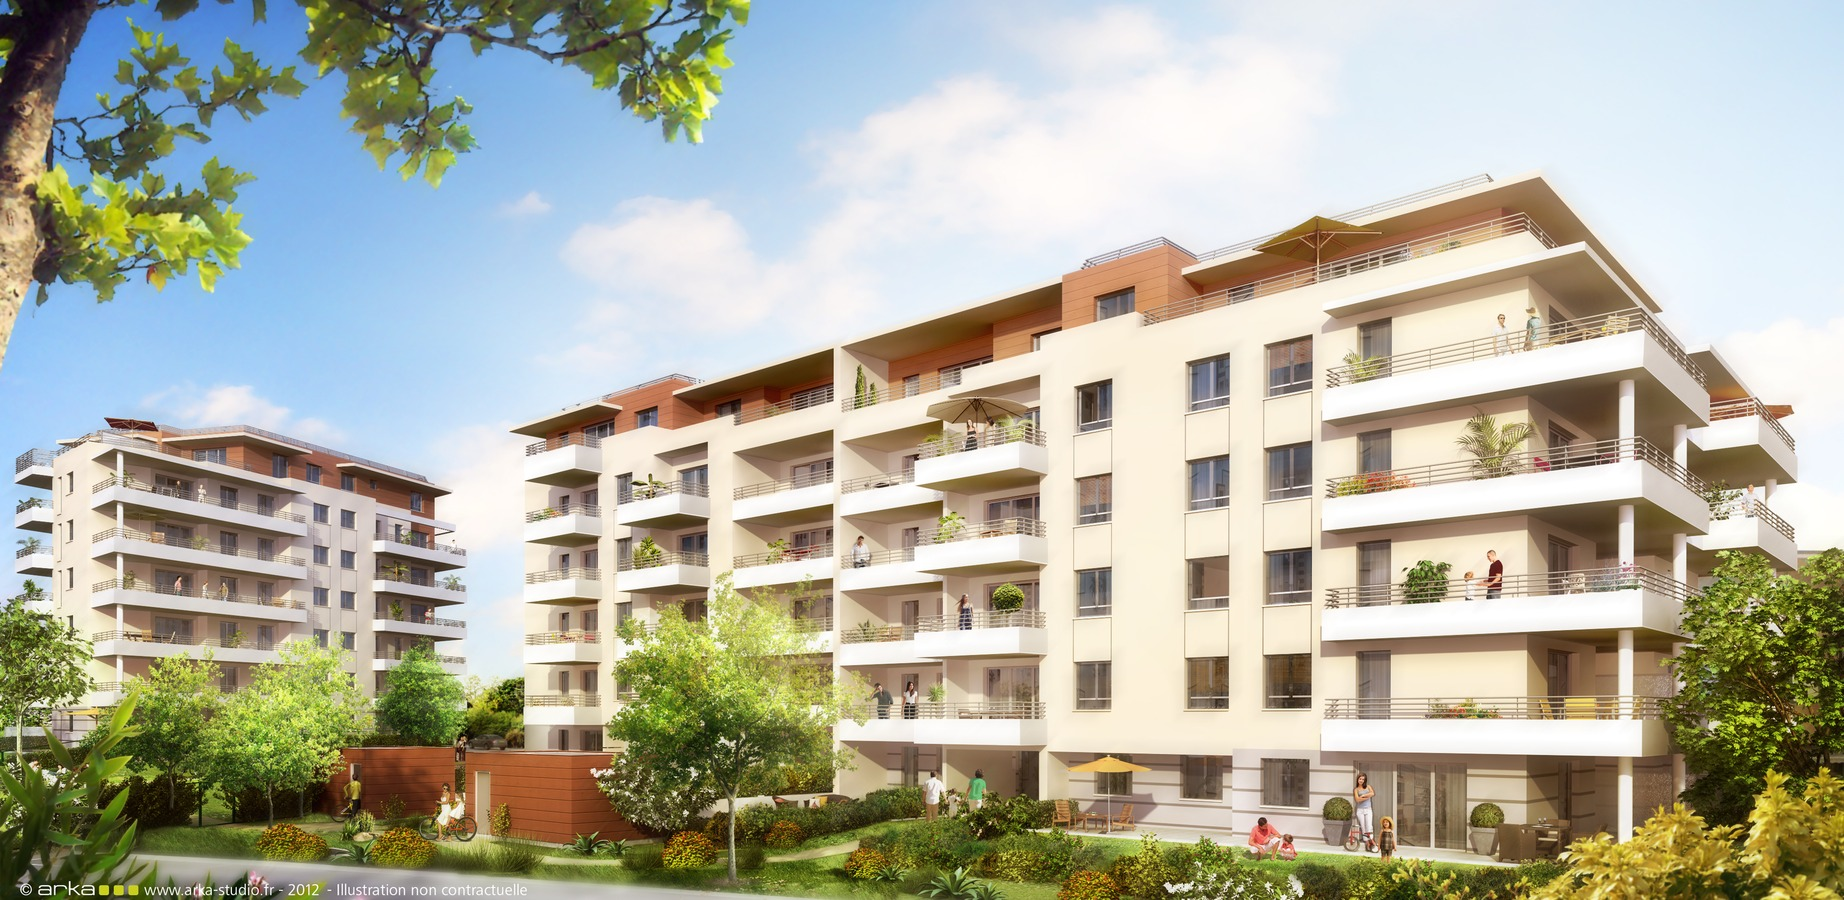 Achat Appartement Neuf Grenoble